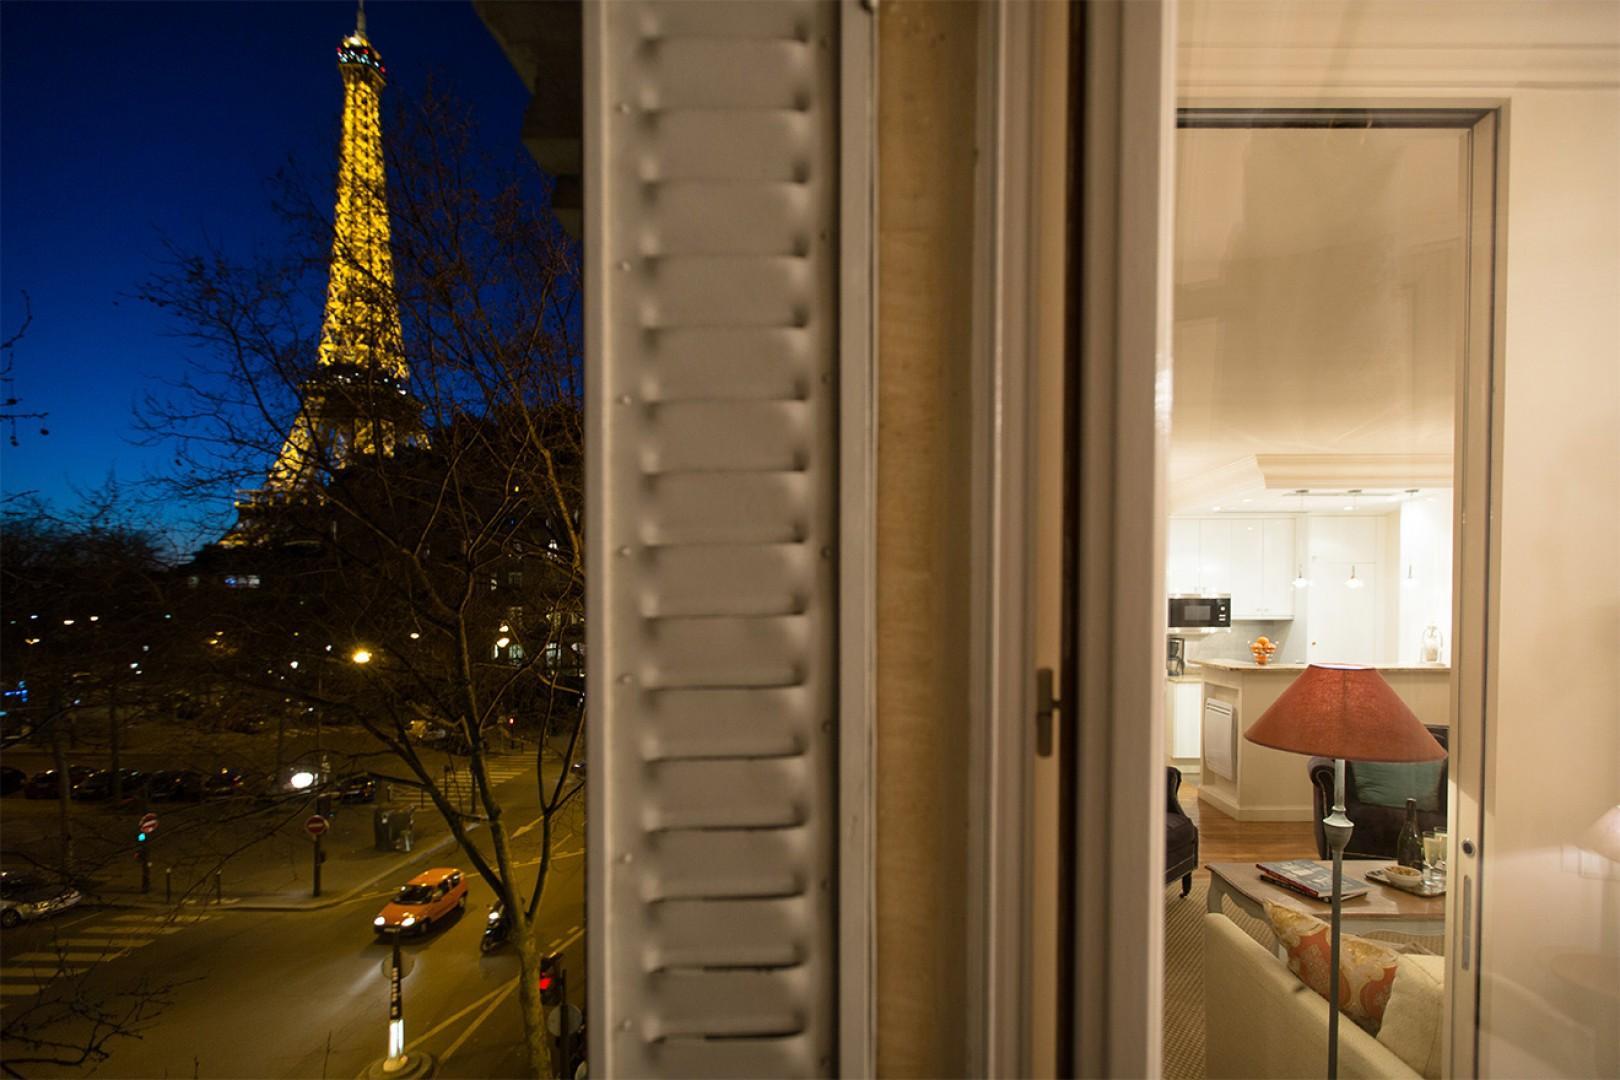 Enjoy the Eiffel Tower light show at night!